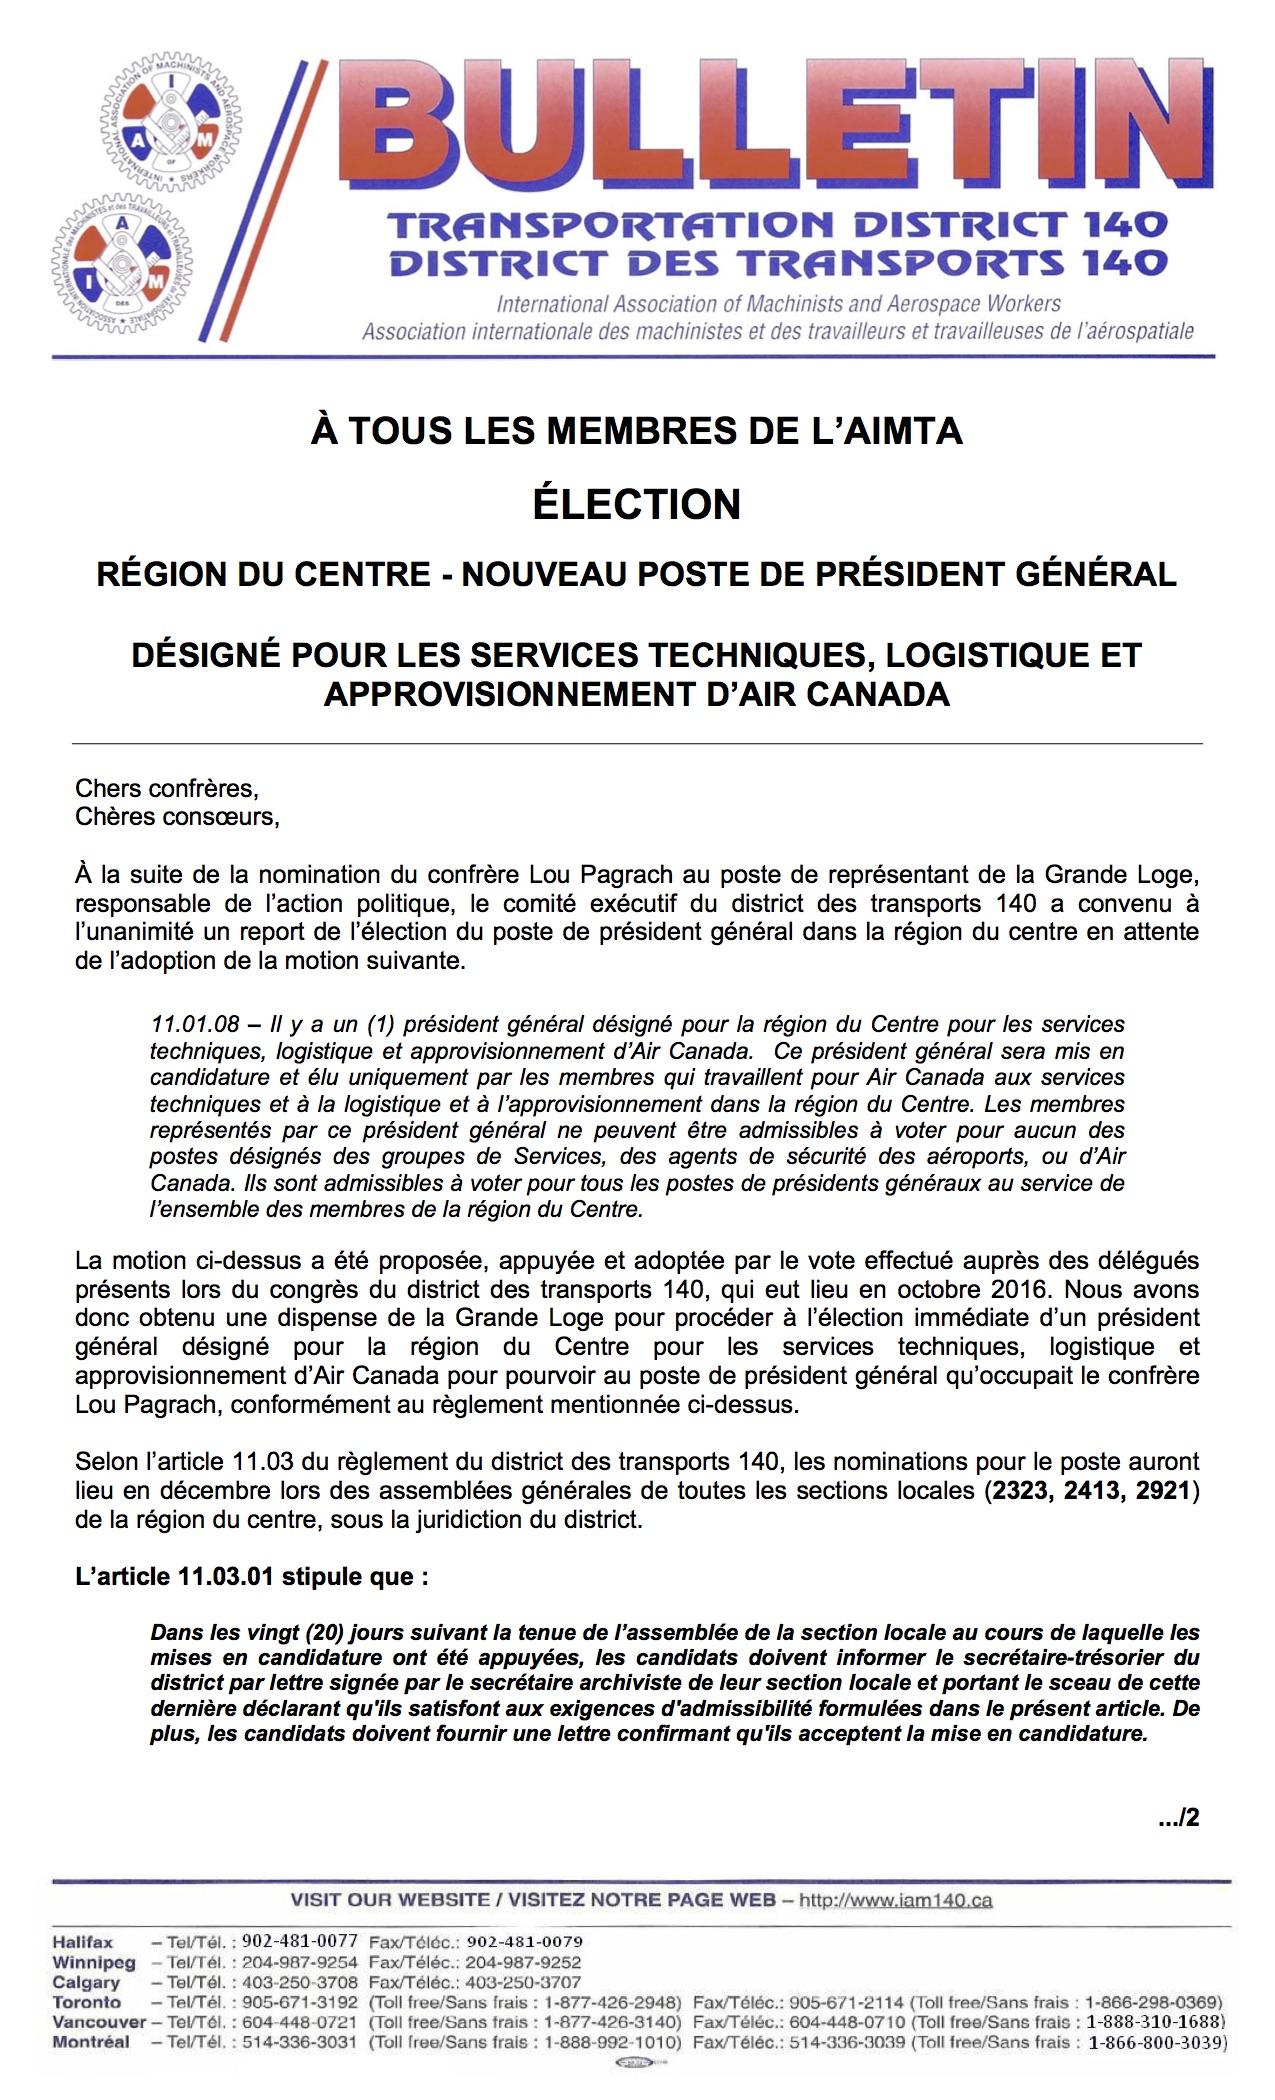 bulletin-073-all-iamaw-new-gc-election-central-region-franc%cc%a7ais